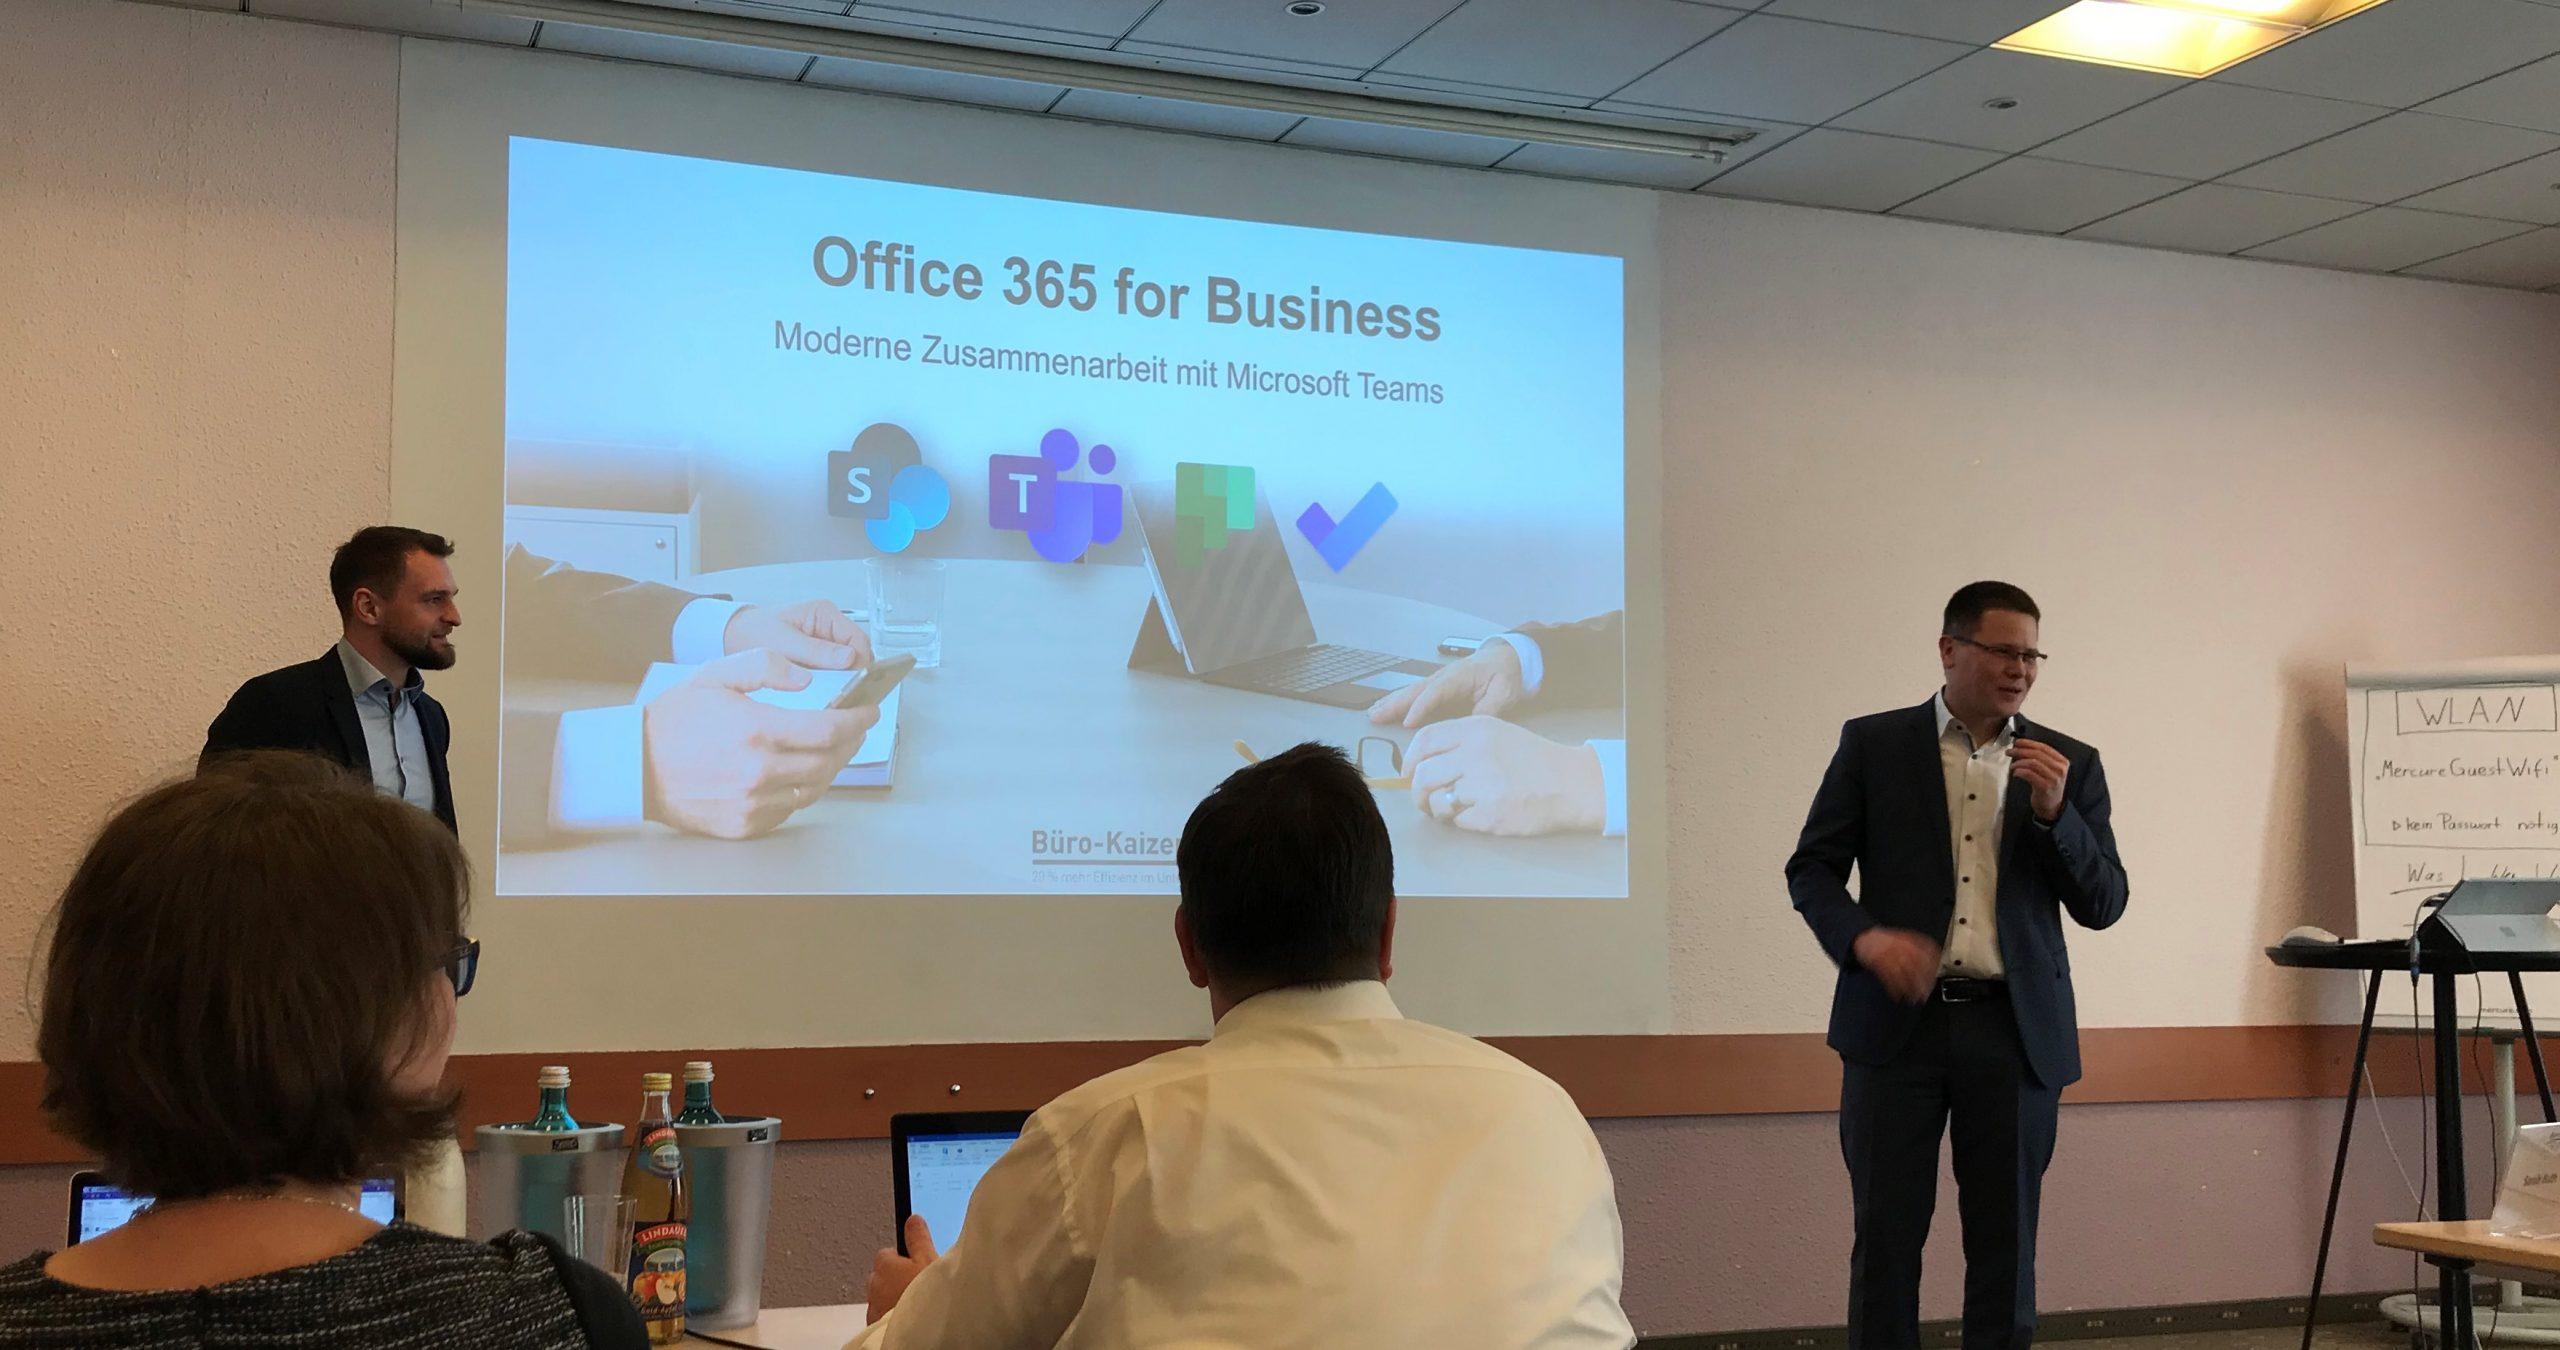 buero-kaizen-office-365-microsoft